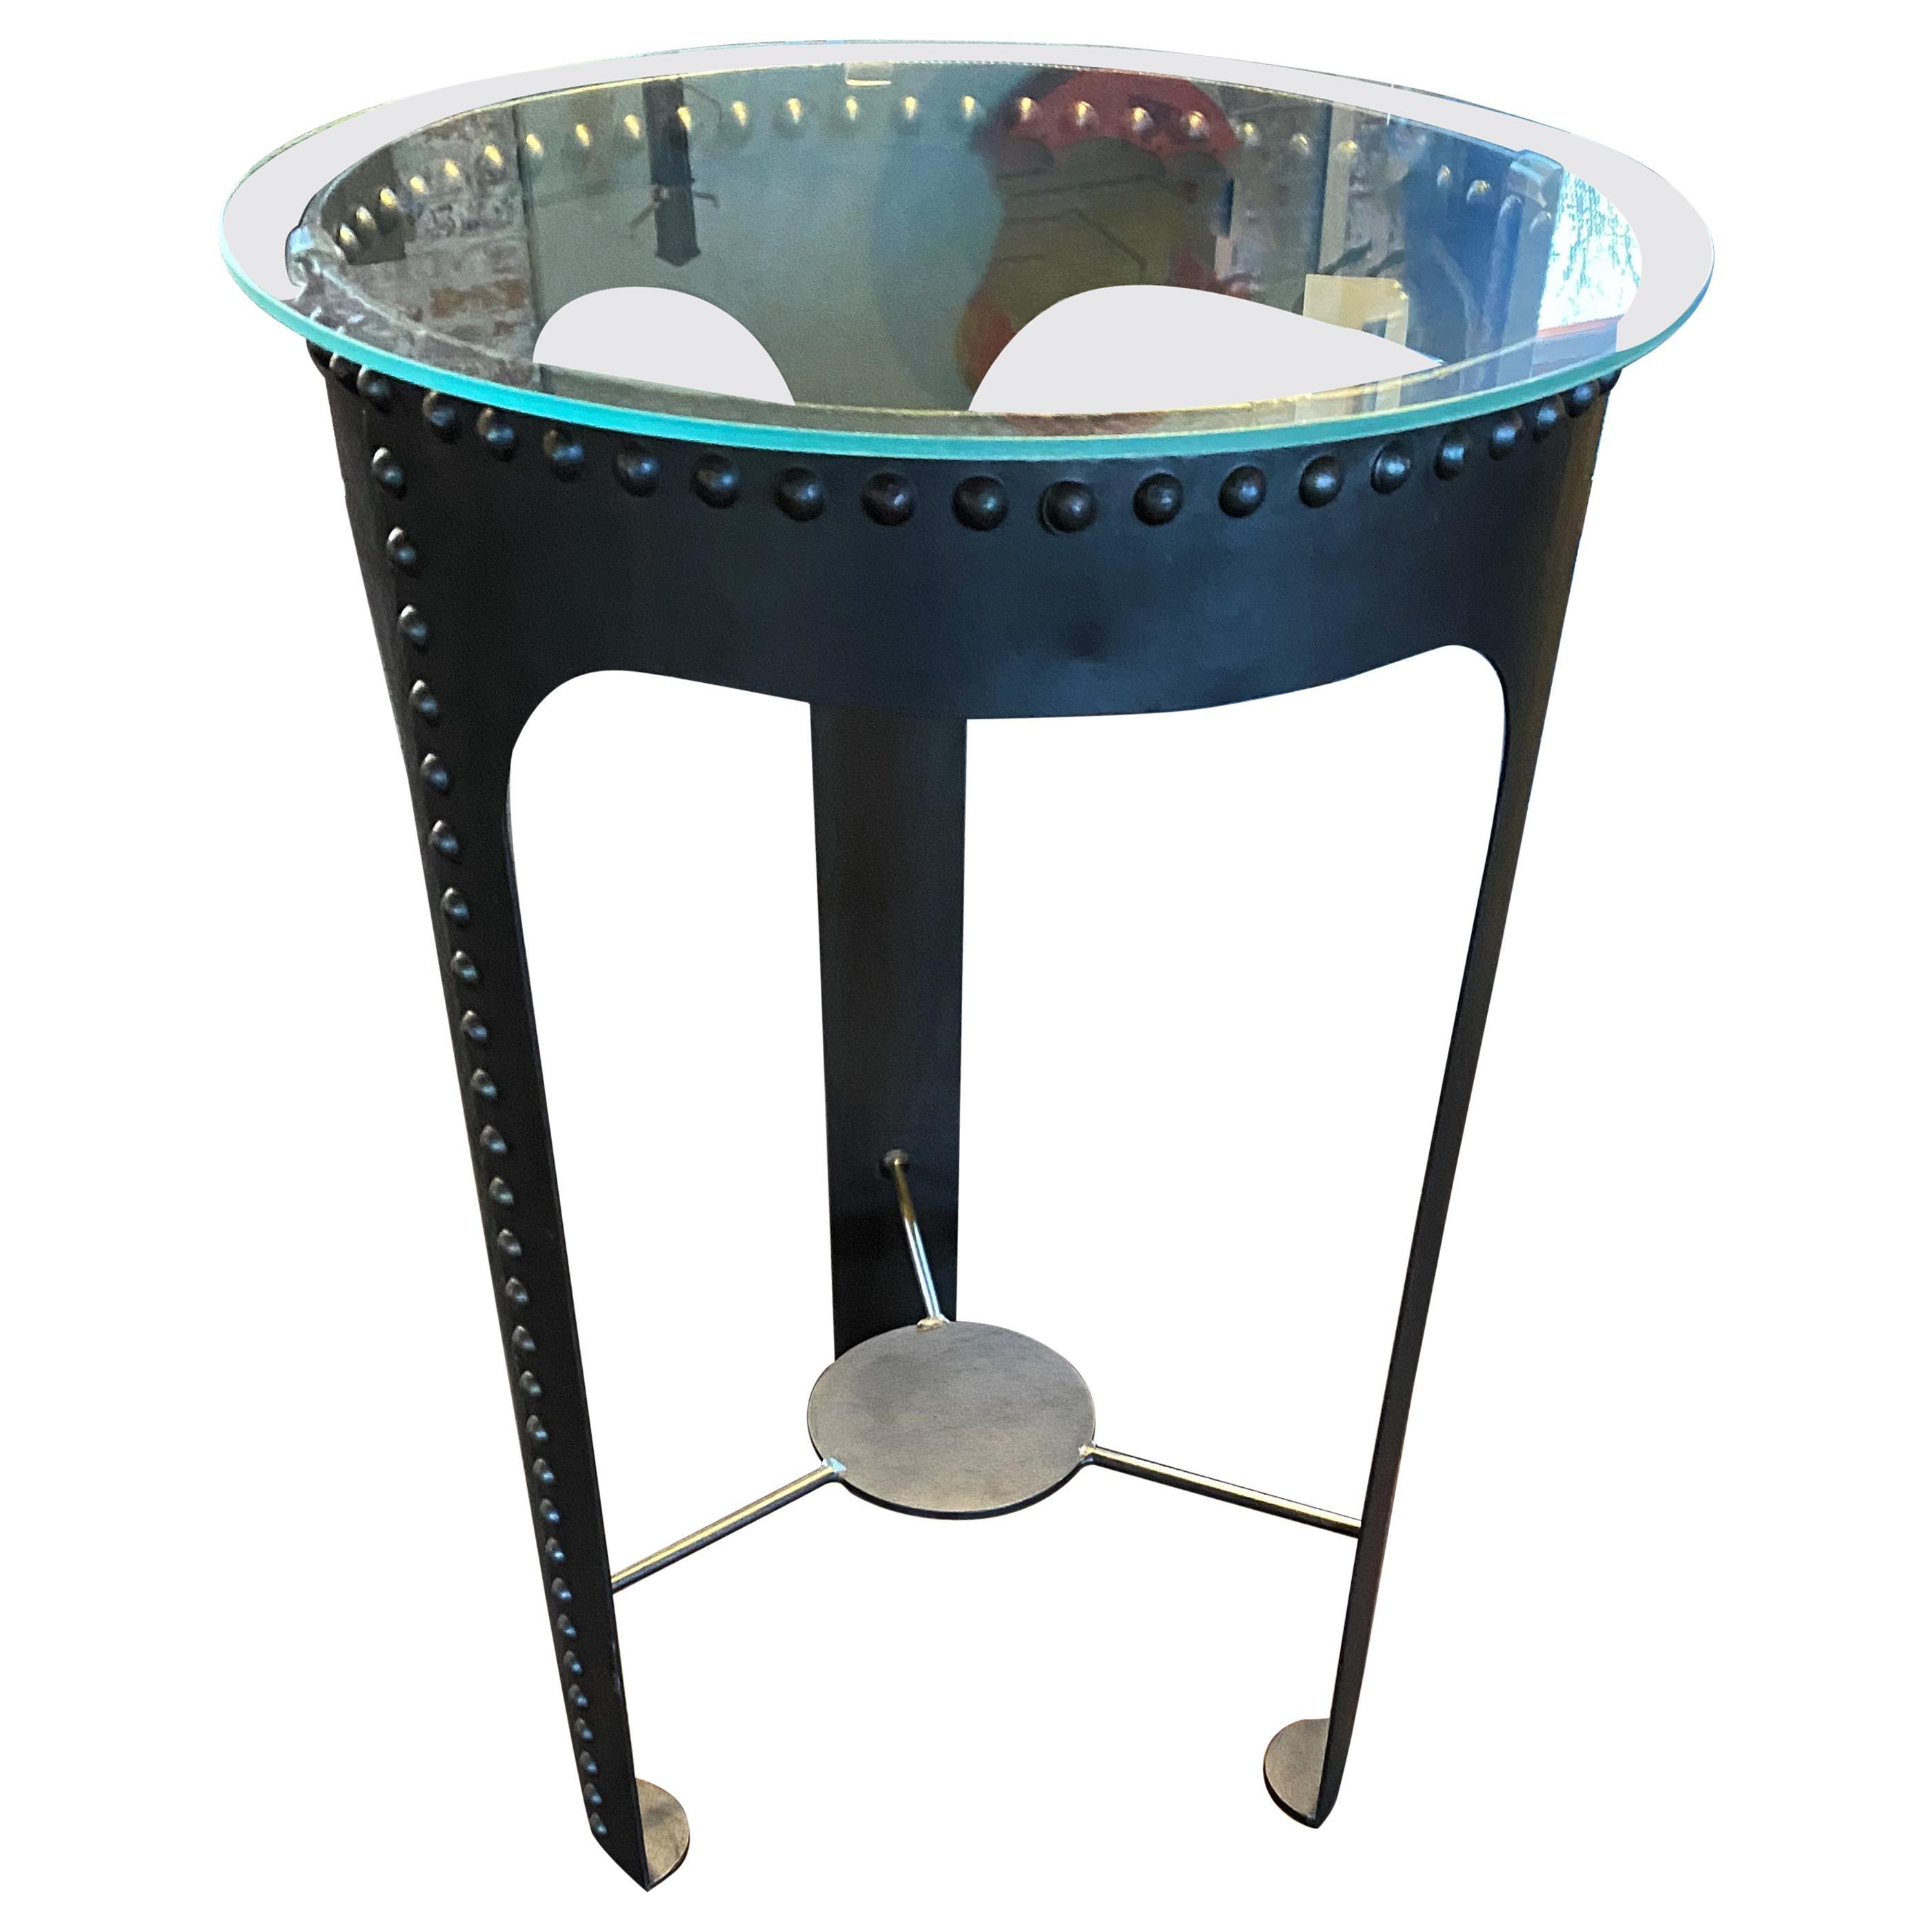 Vintage Industrial Riveted Tank Table #2